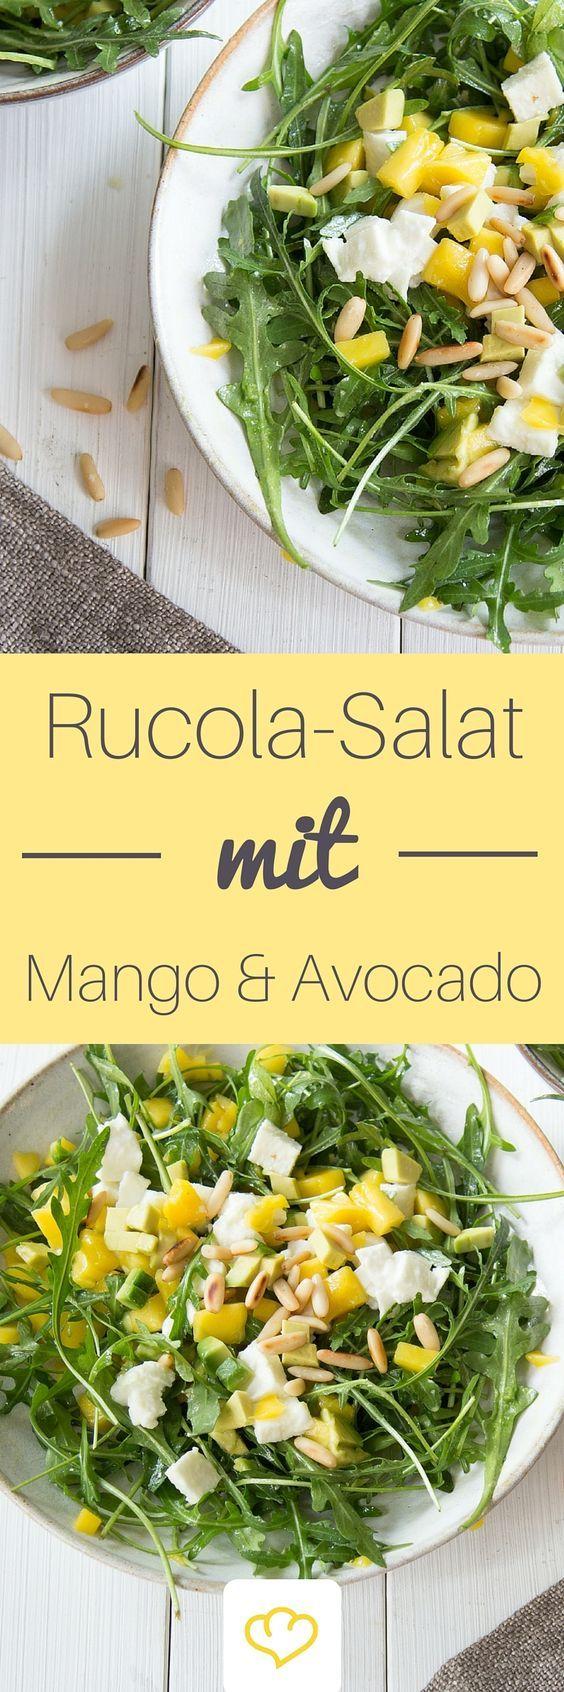 avocado mango salat mit rucola rezept rezept pinterest mango salat salat und rucola salat. Black Bedroom Furniture Sets. Home Design Ideas